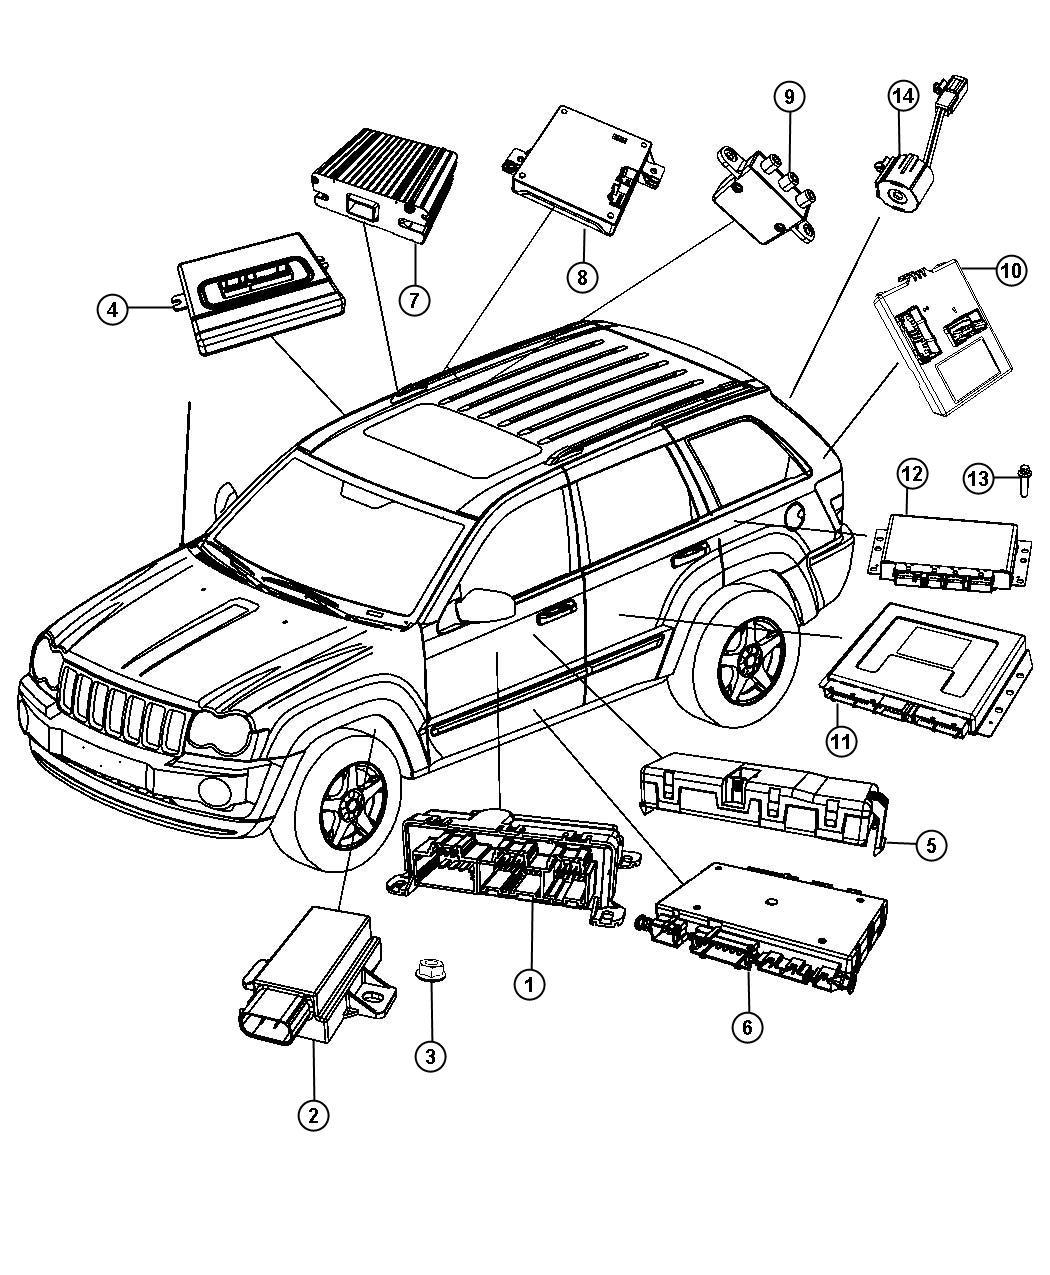 Jeep Grand Cherokee Module. Transfer case control. [dka